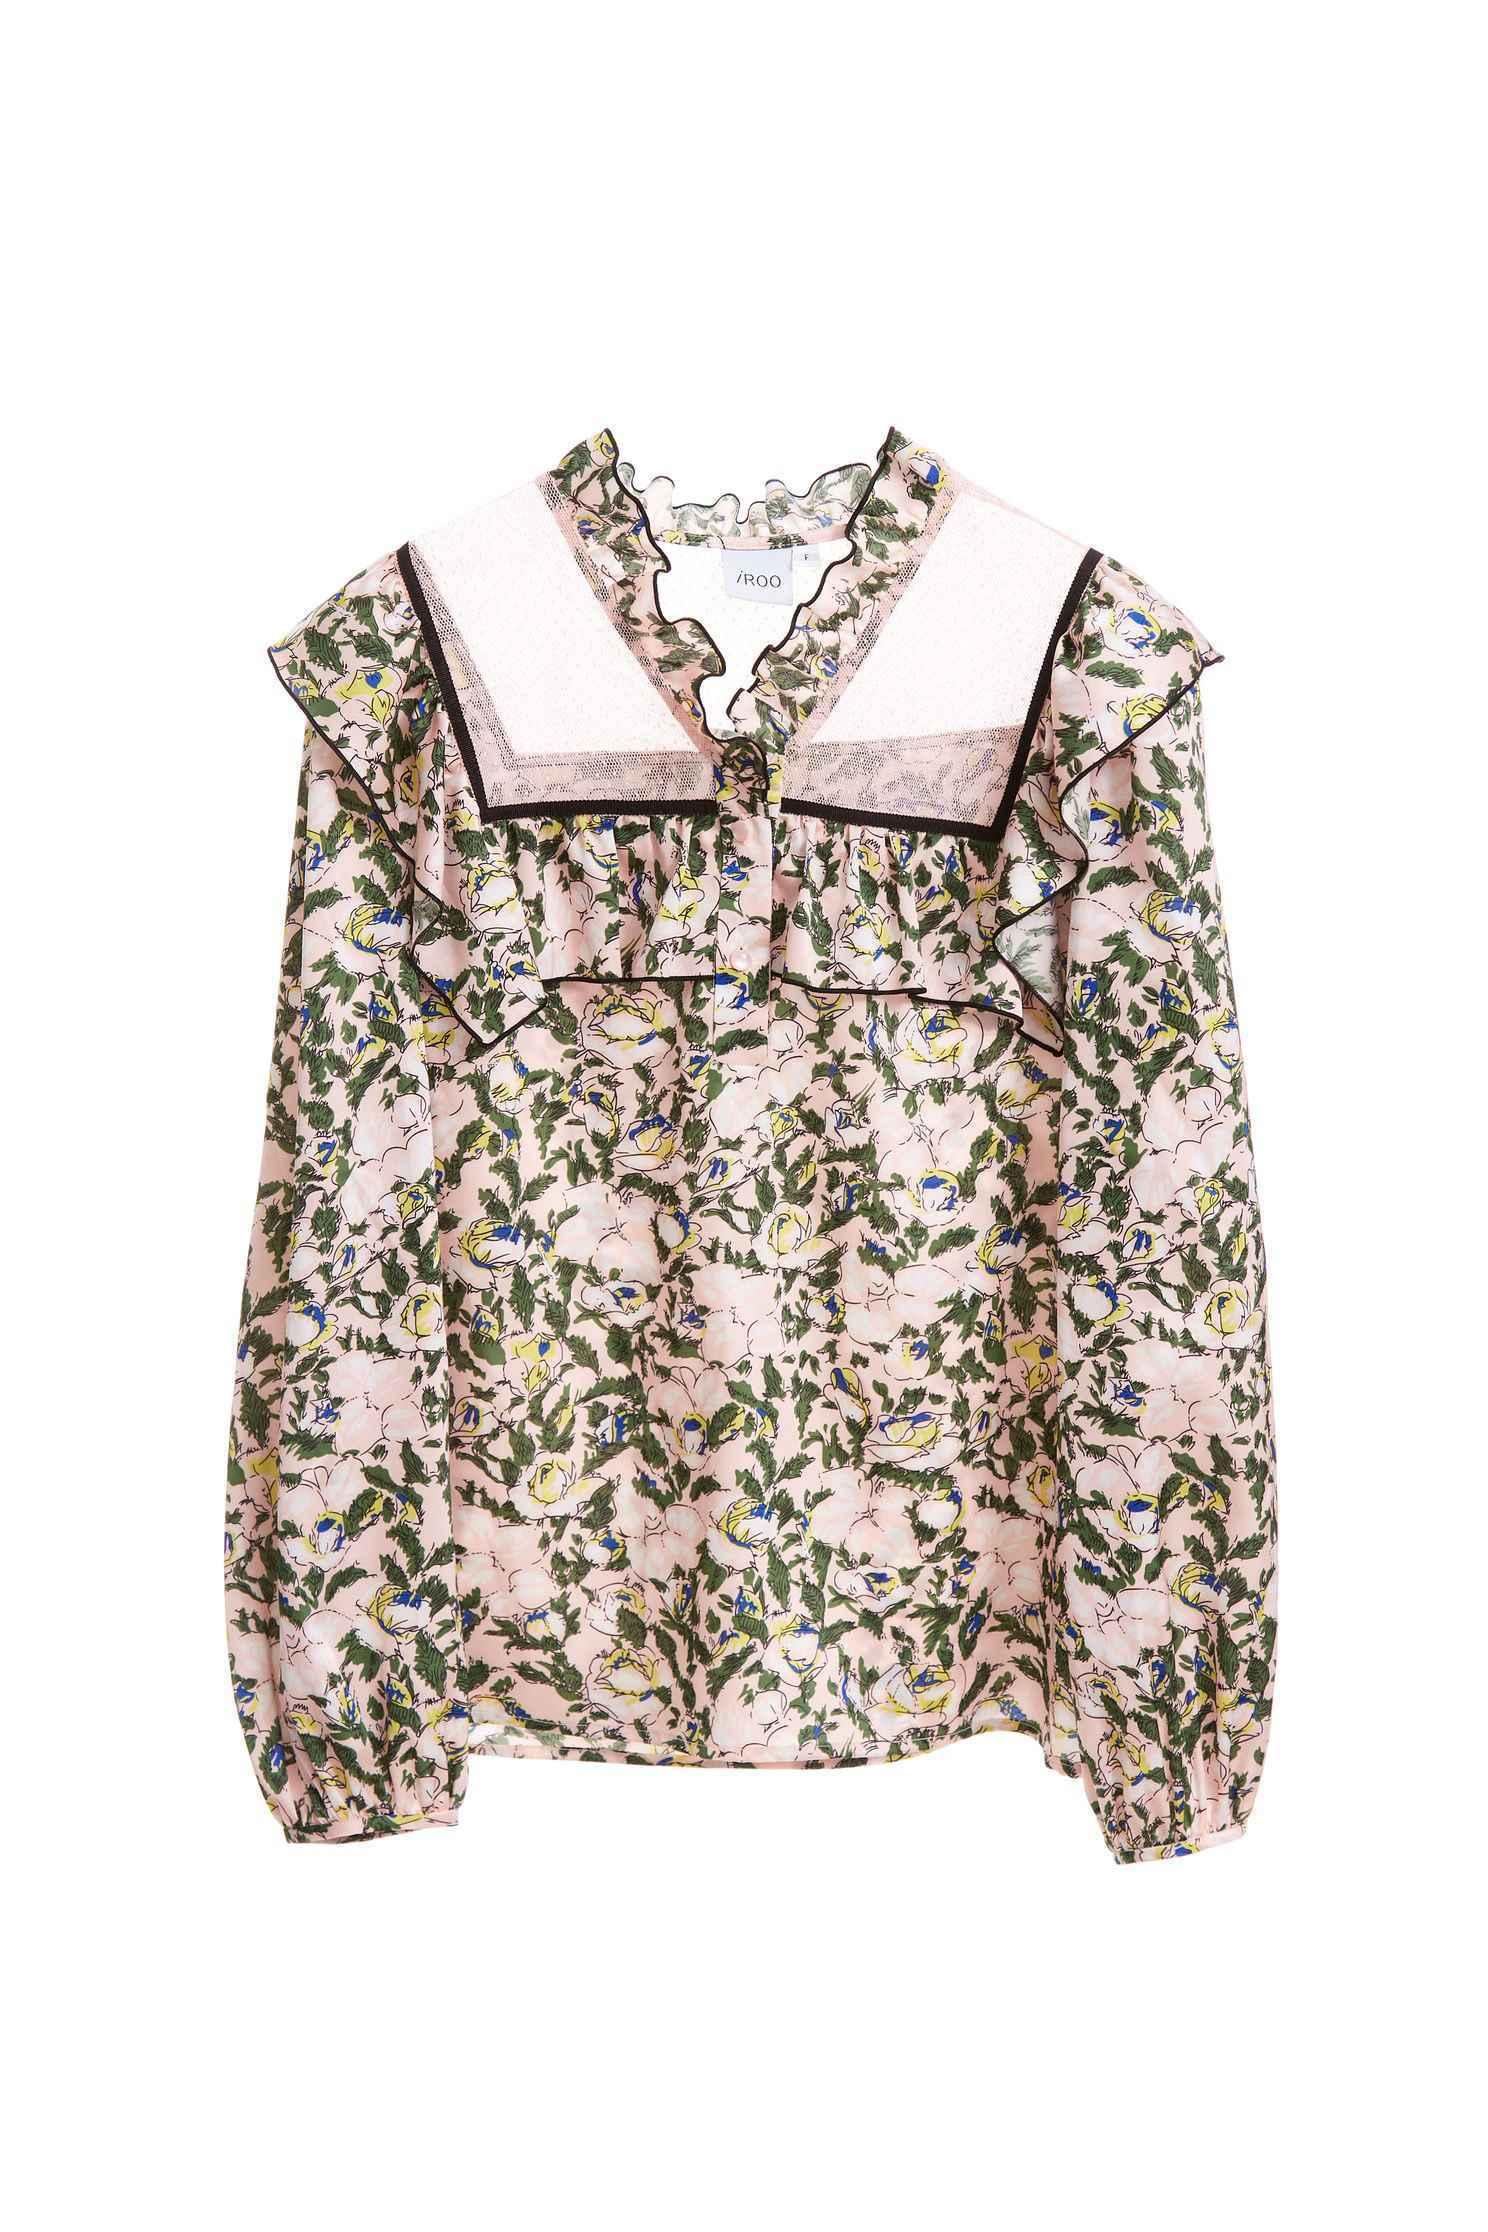 Classic flowery  designed shirts